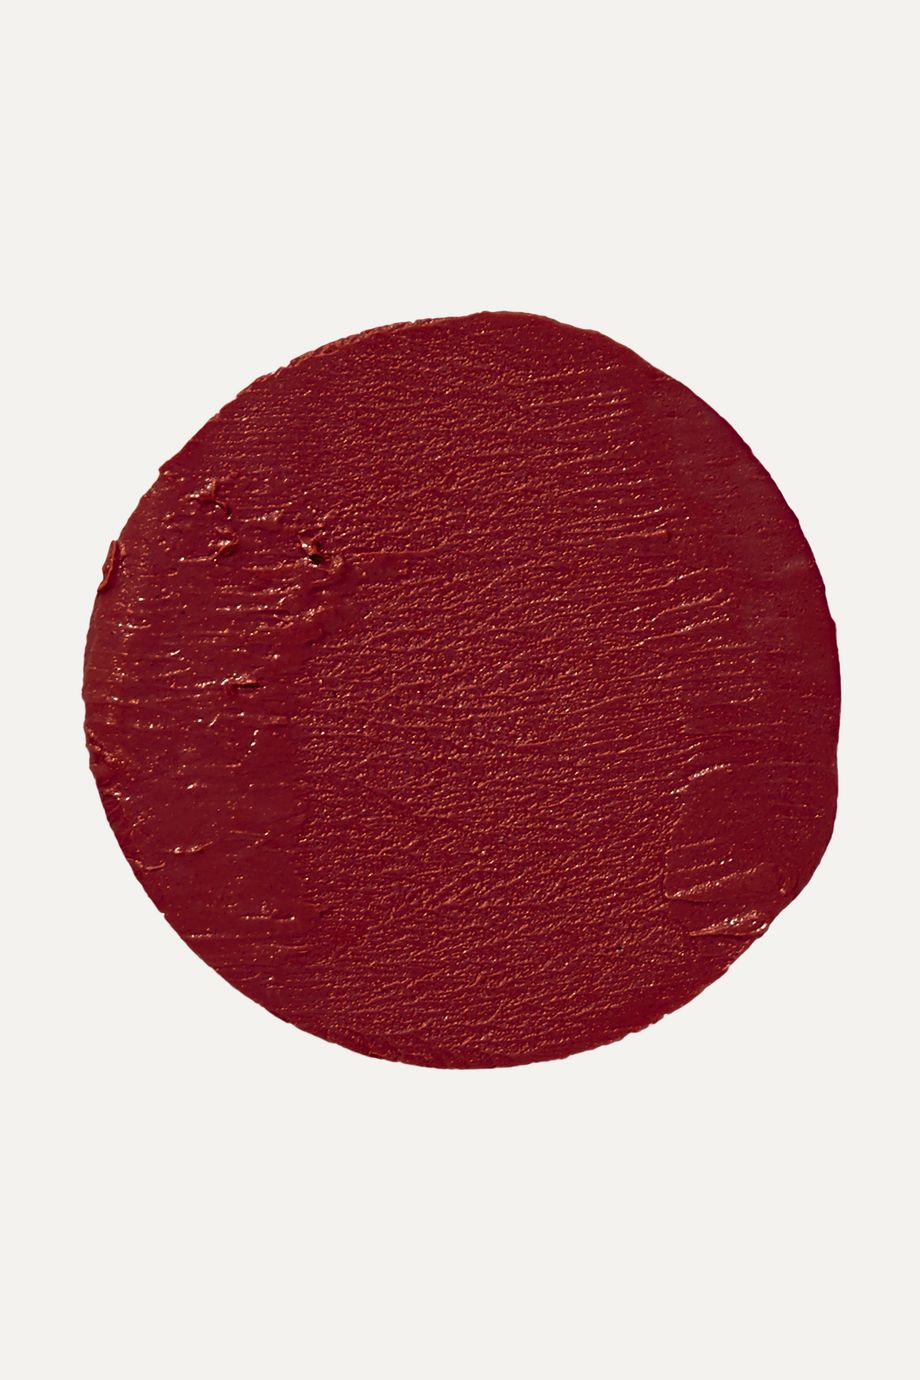 Oribe Lip Lust Crème Lipstick - Ruby Red